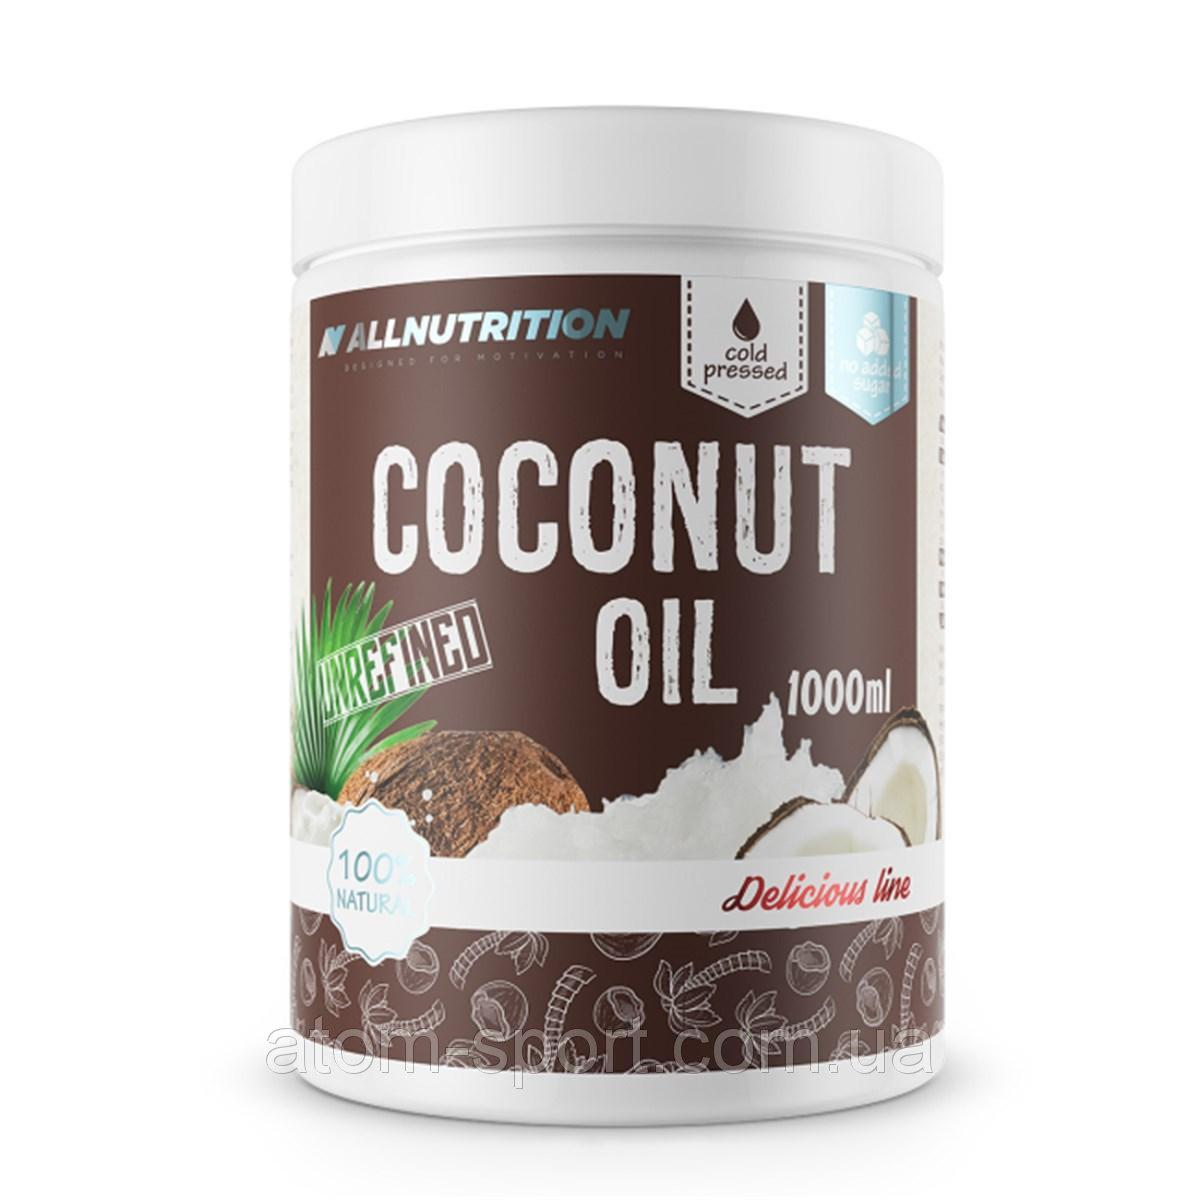 AllNutrition Coconut Oil 1000 ml нерафинированное